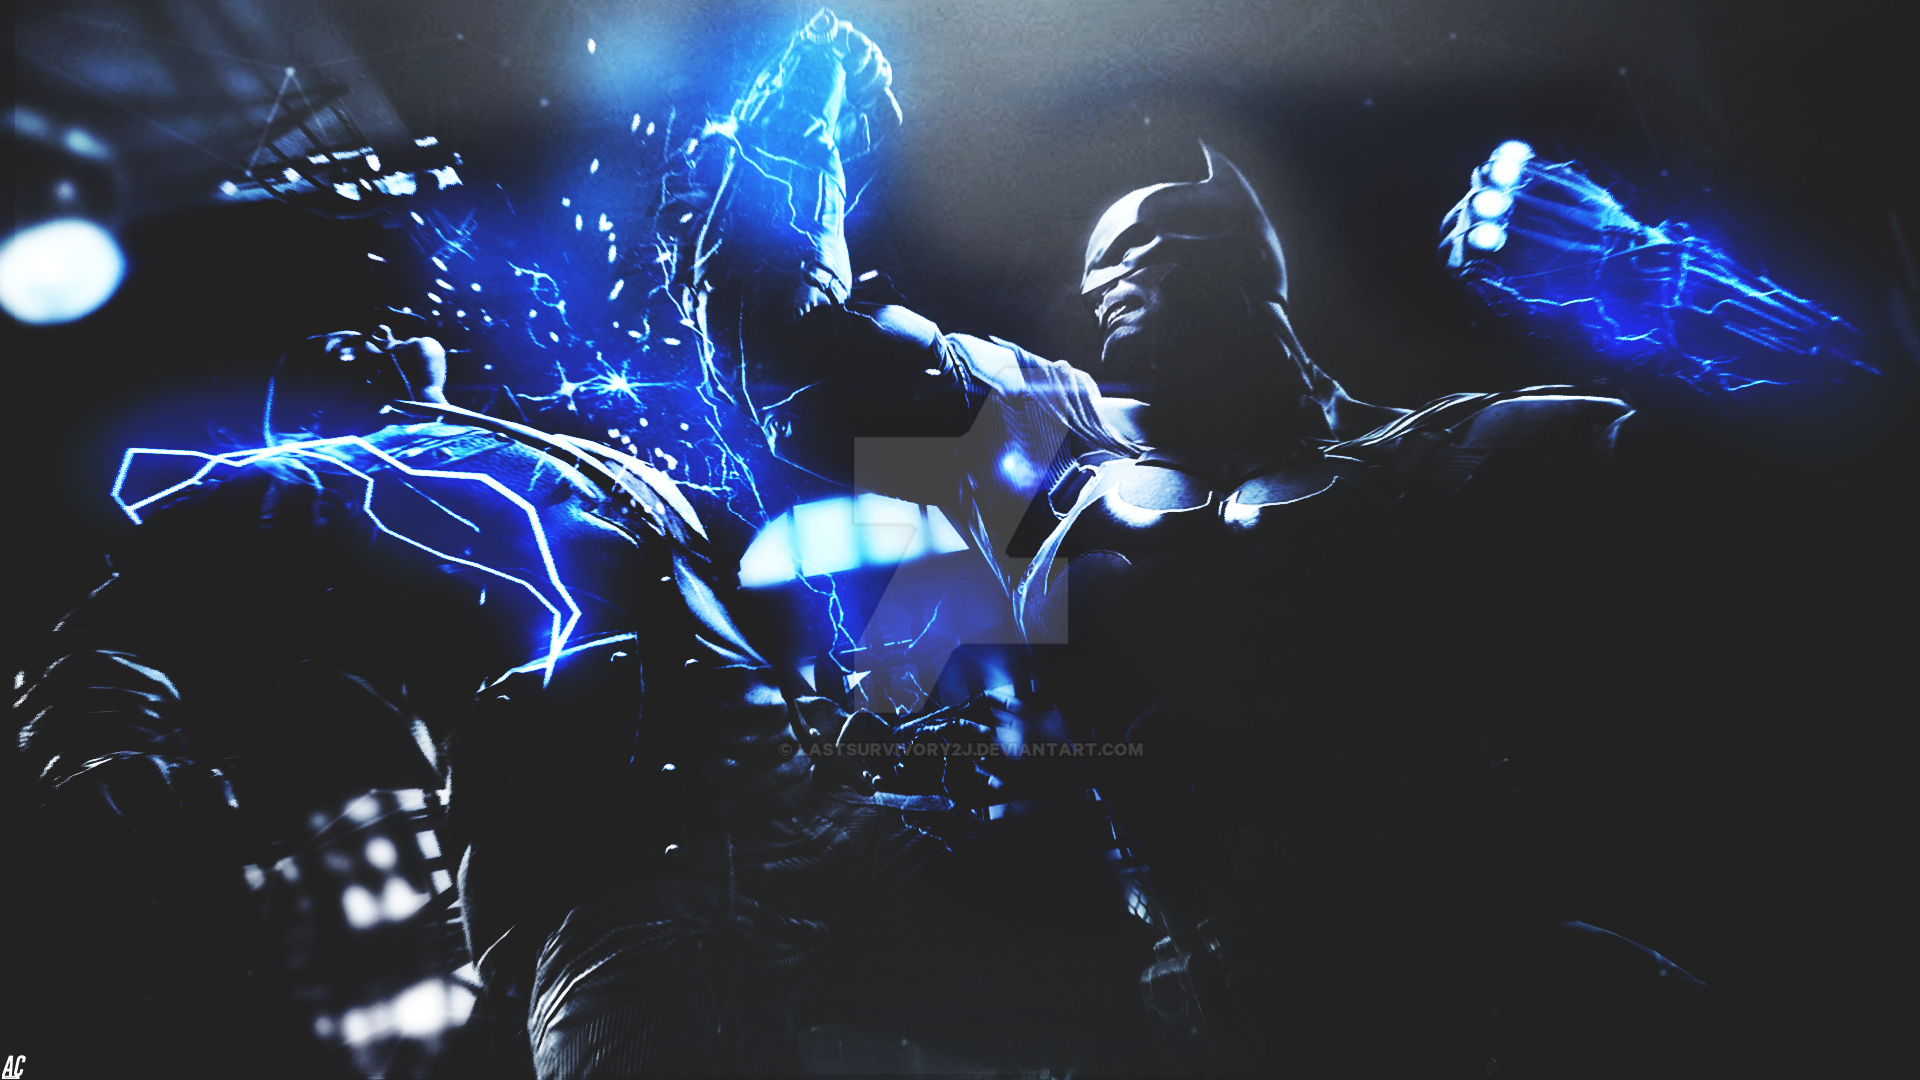 Batman Arkham Origins retouch. by LastSurvivorY2J